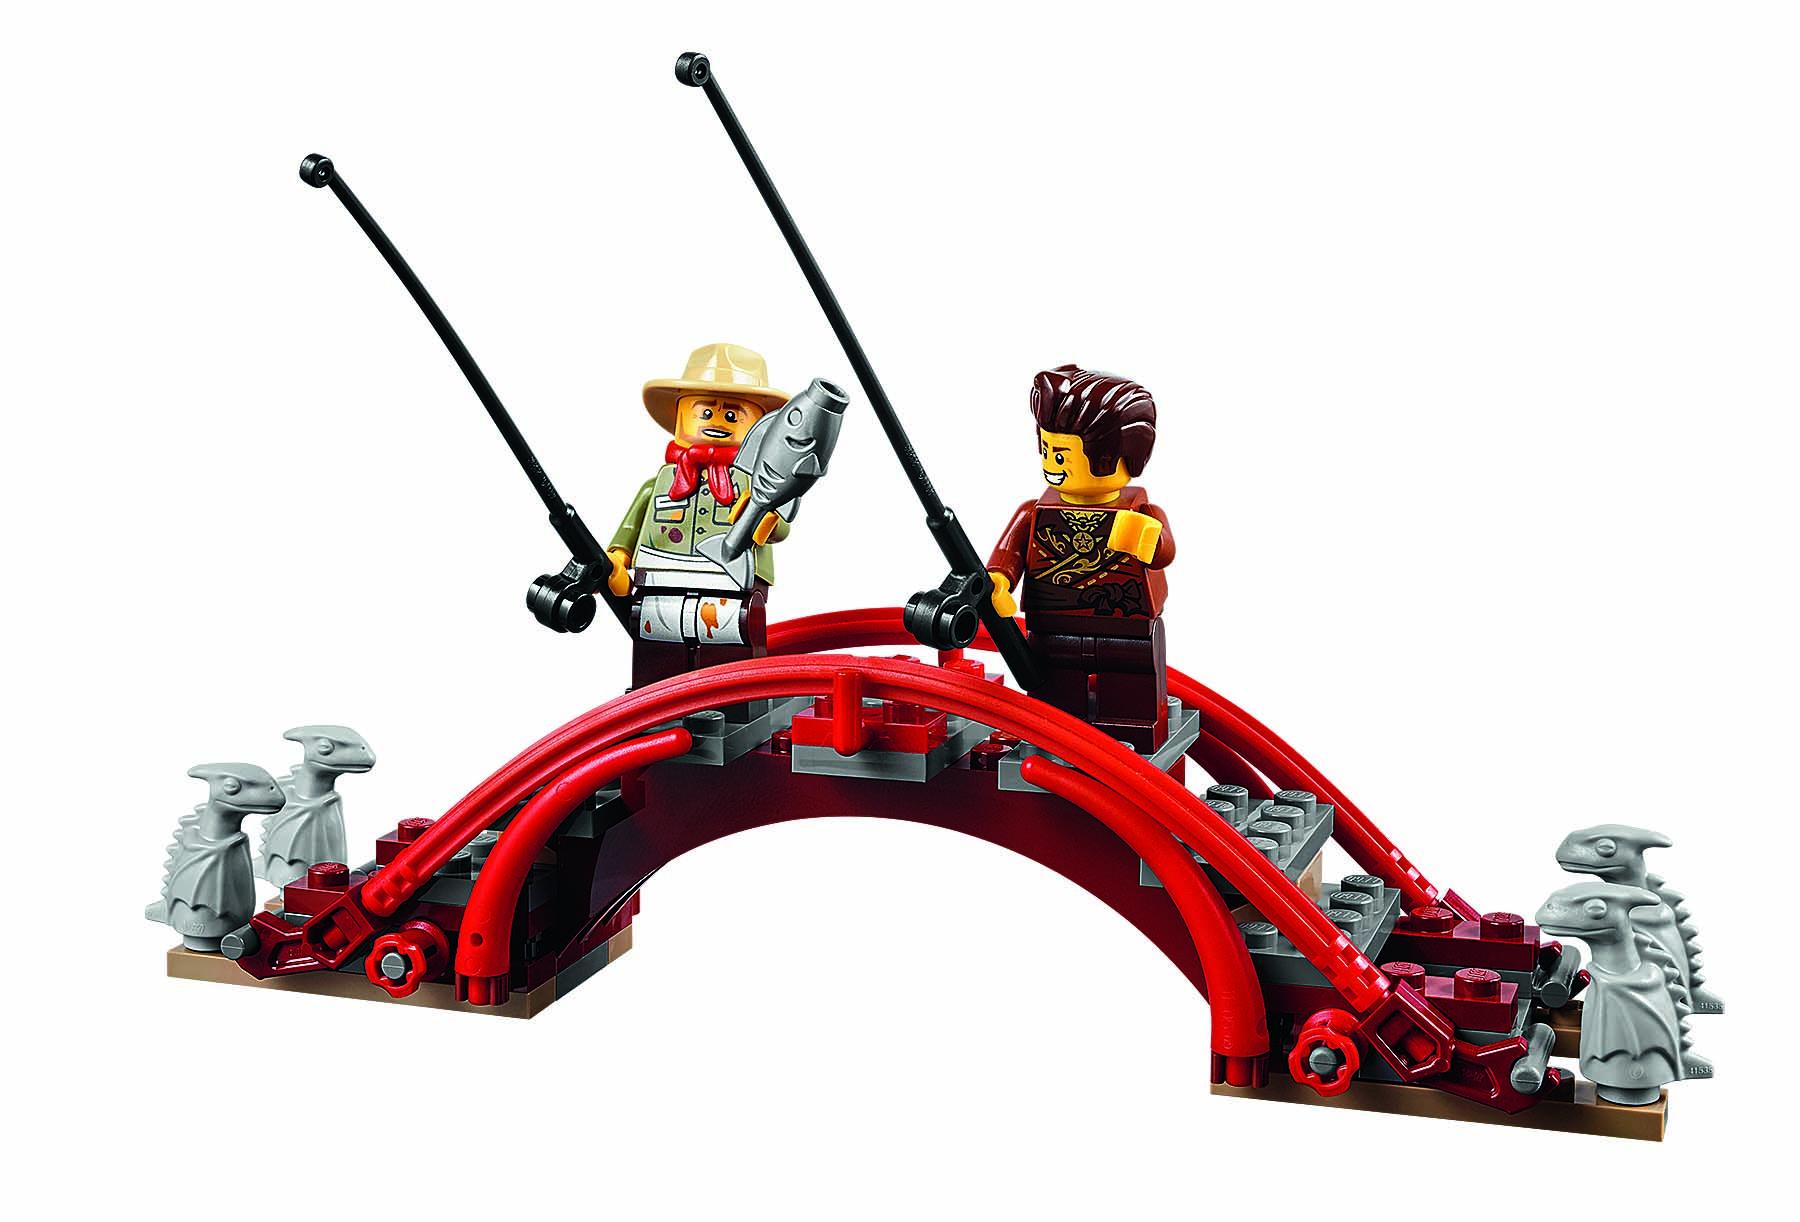 Lego Unveils Stunning Ninjago Temple Of Airjitzu Set